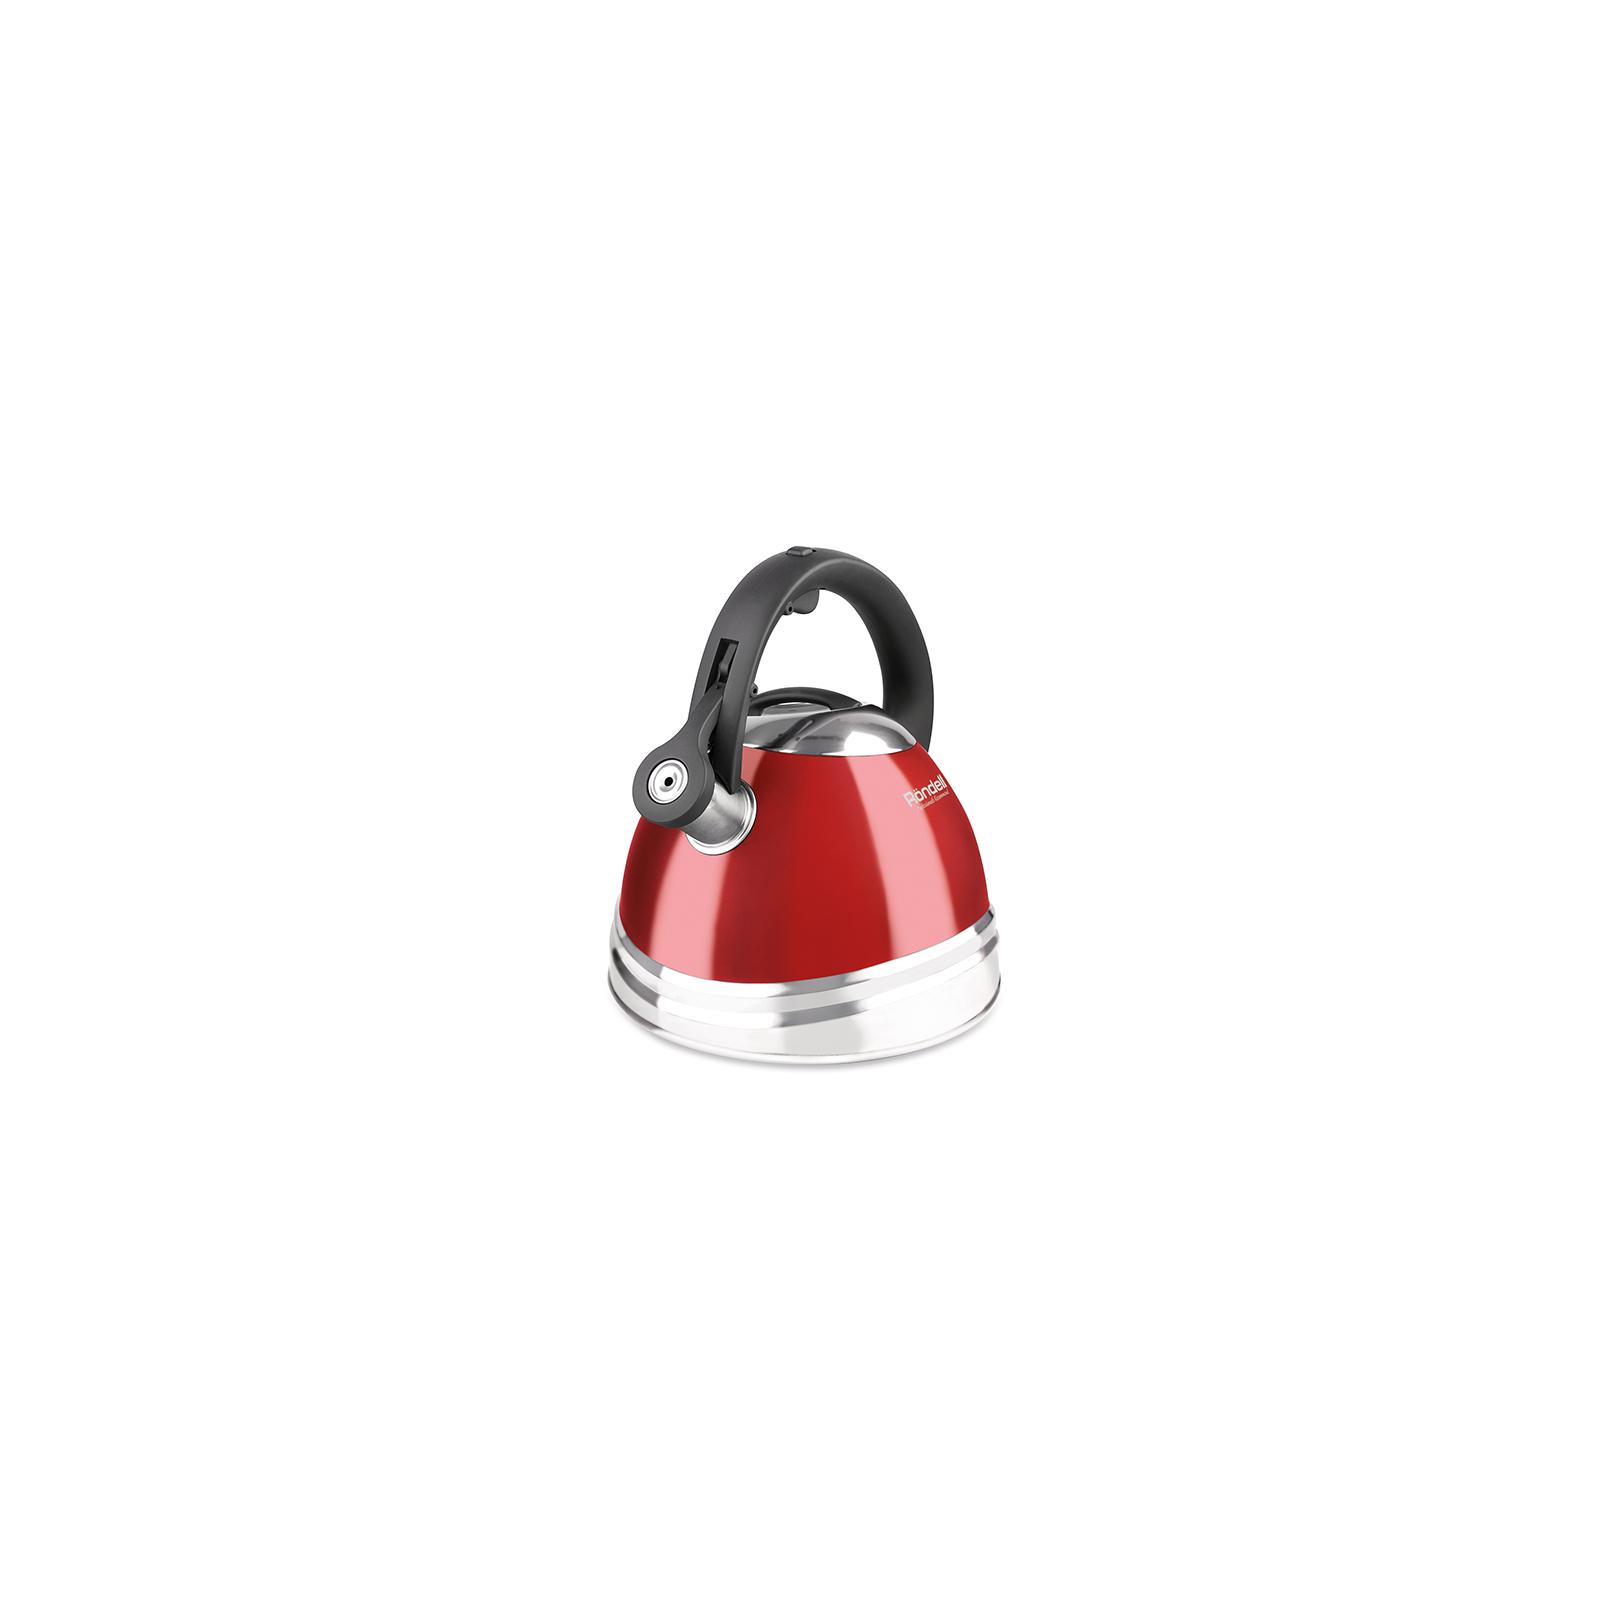 Чайник Rondell Fiero со свистком 3 л Red (RDS-498) изображение 2